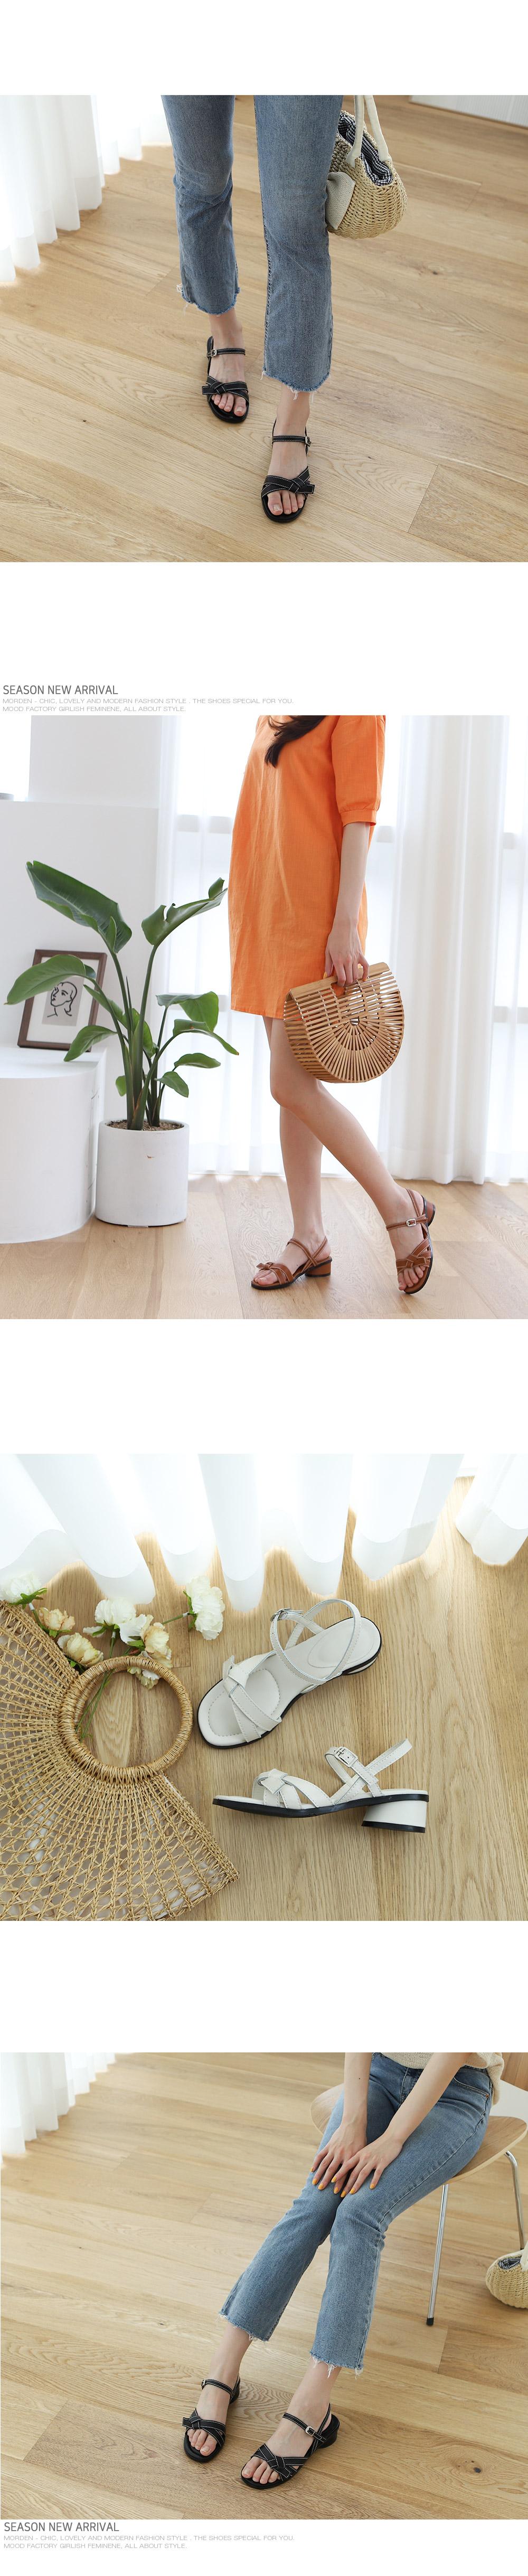 [Handmade] Stitch Bow Décor Leather Sandals-Holiholic